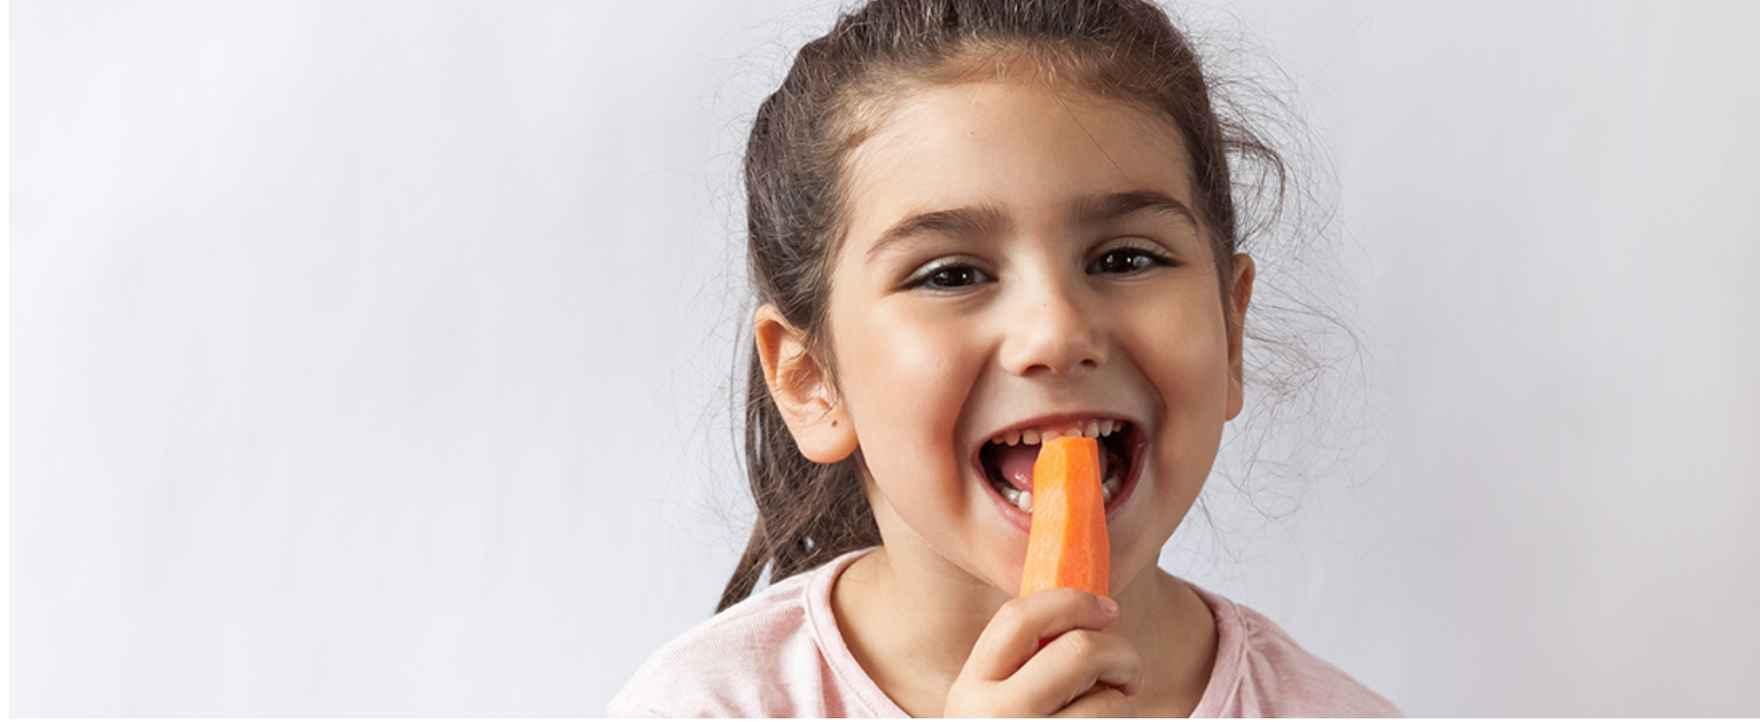 pige spiser gulerod